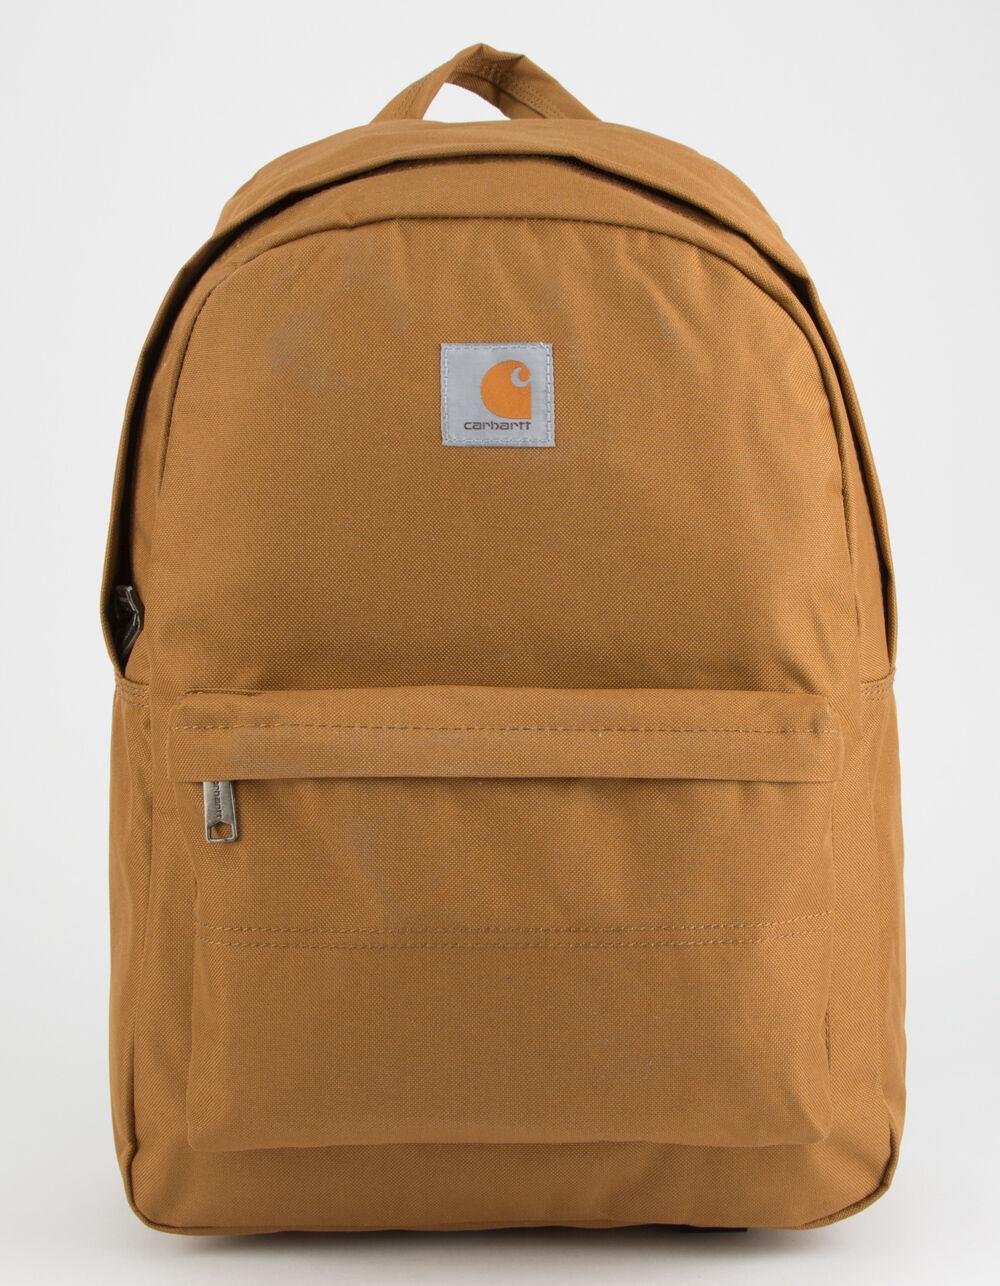 CARHARTT Trade Carhartt Brown Backpack